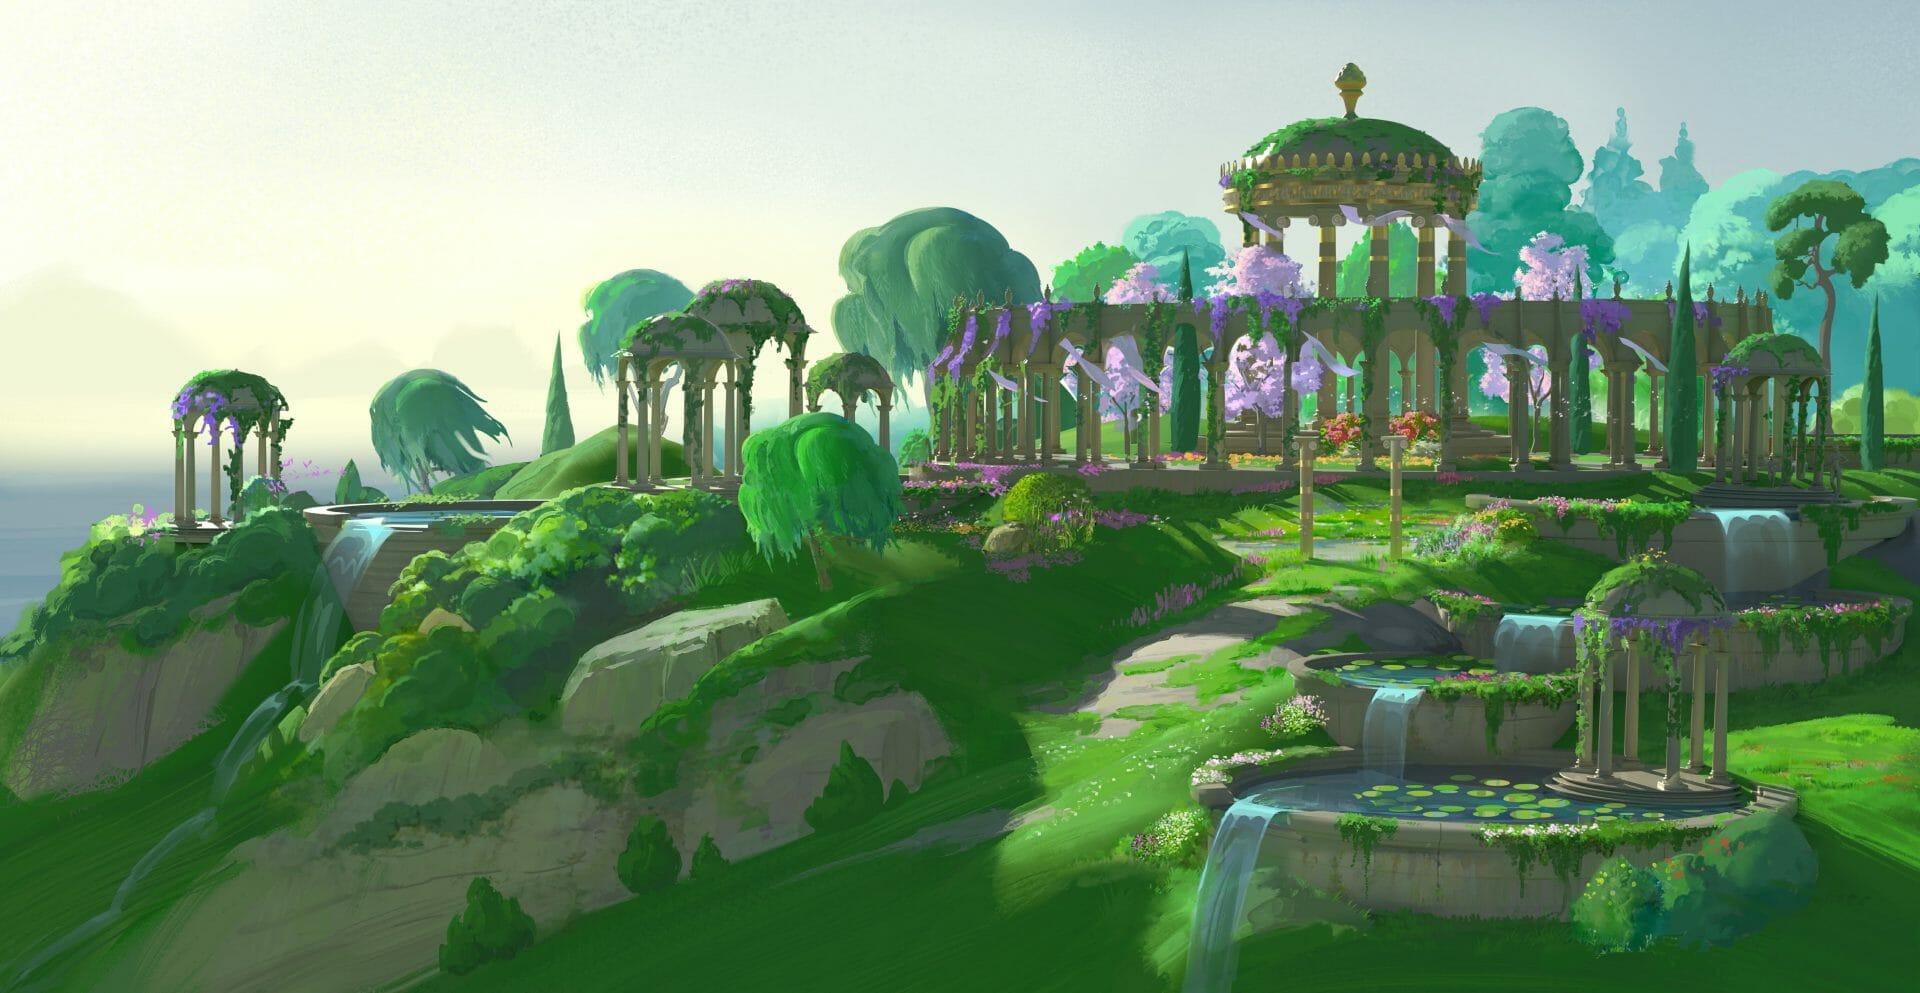 Aphrodite Palace of Wind